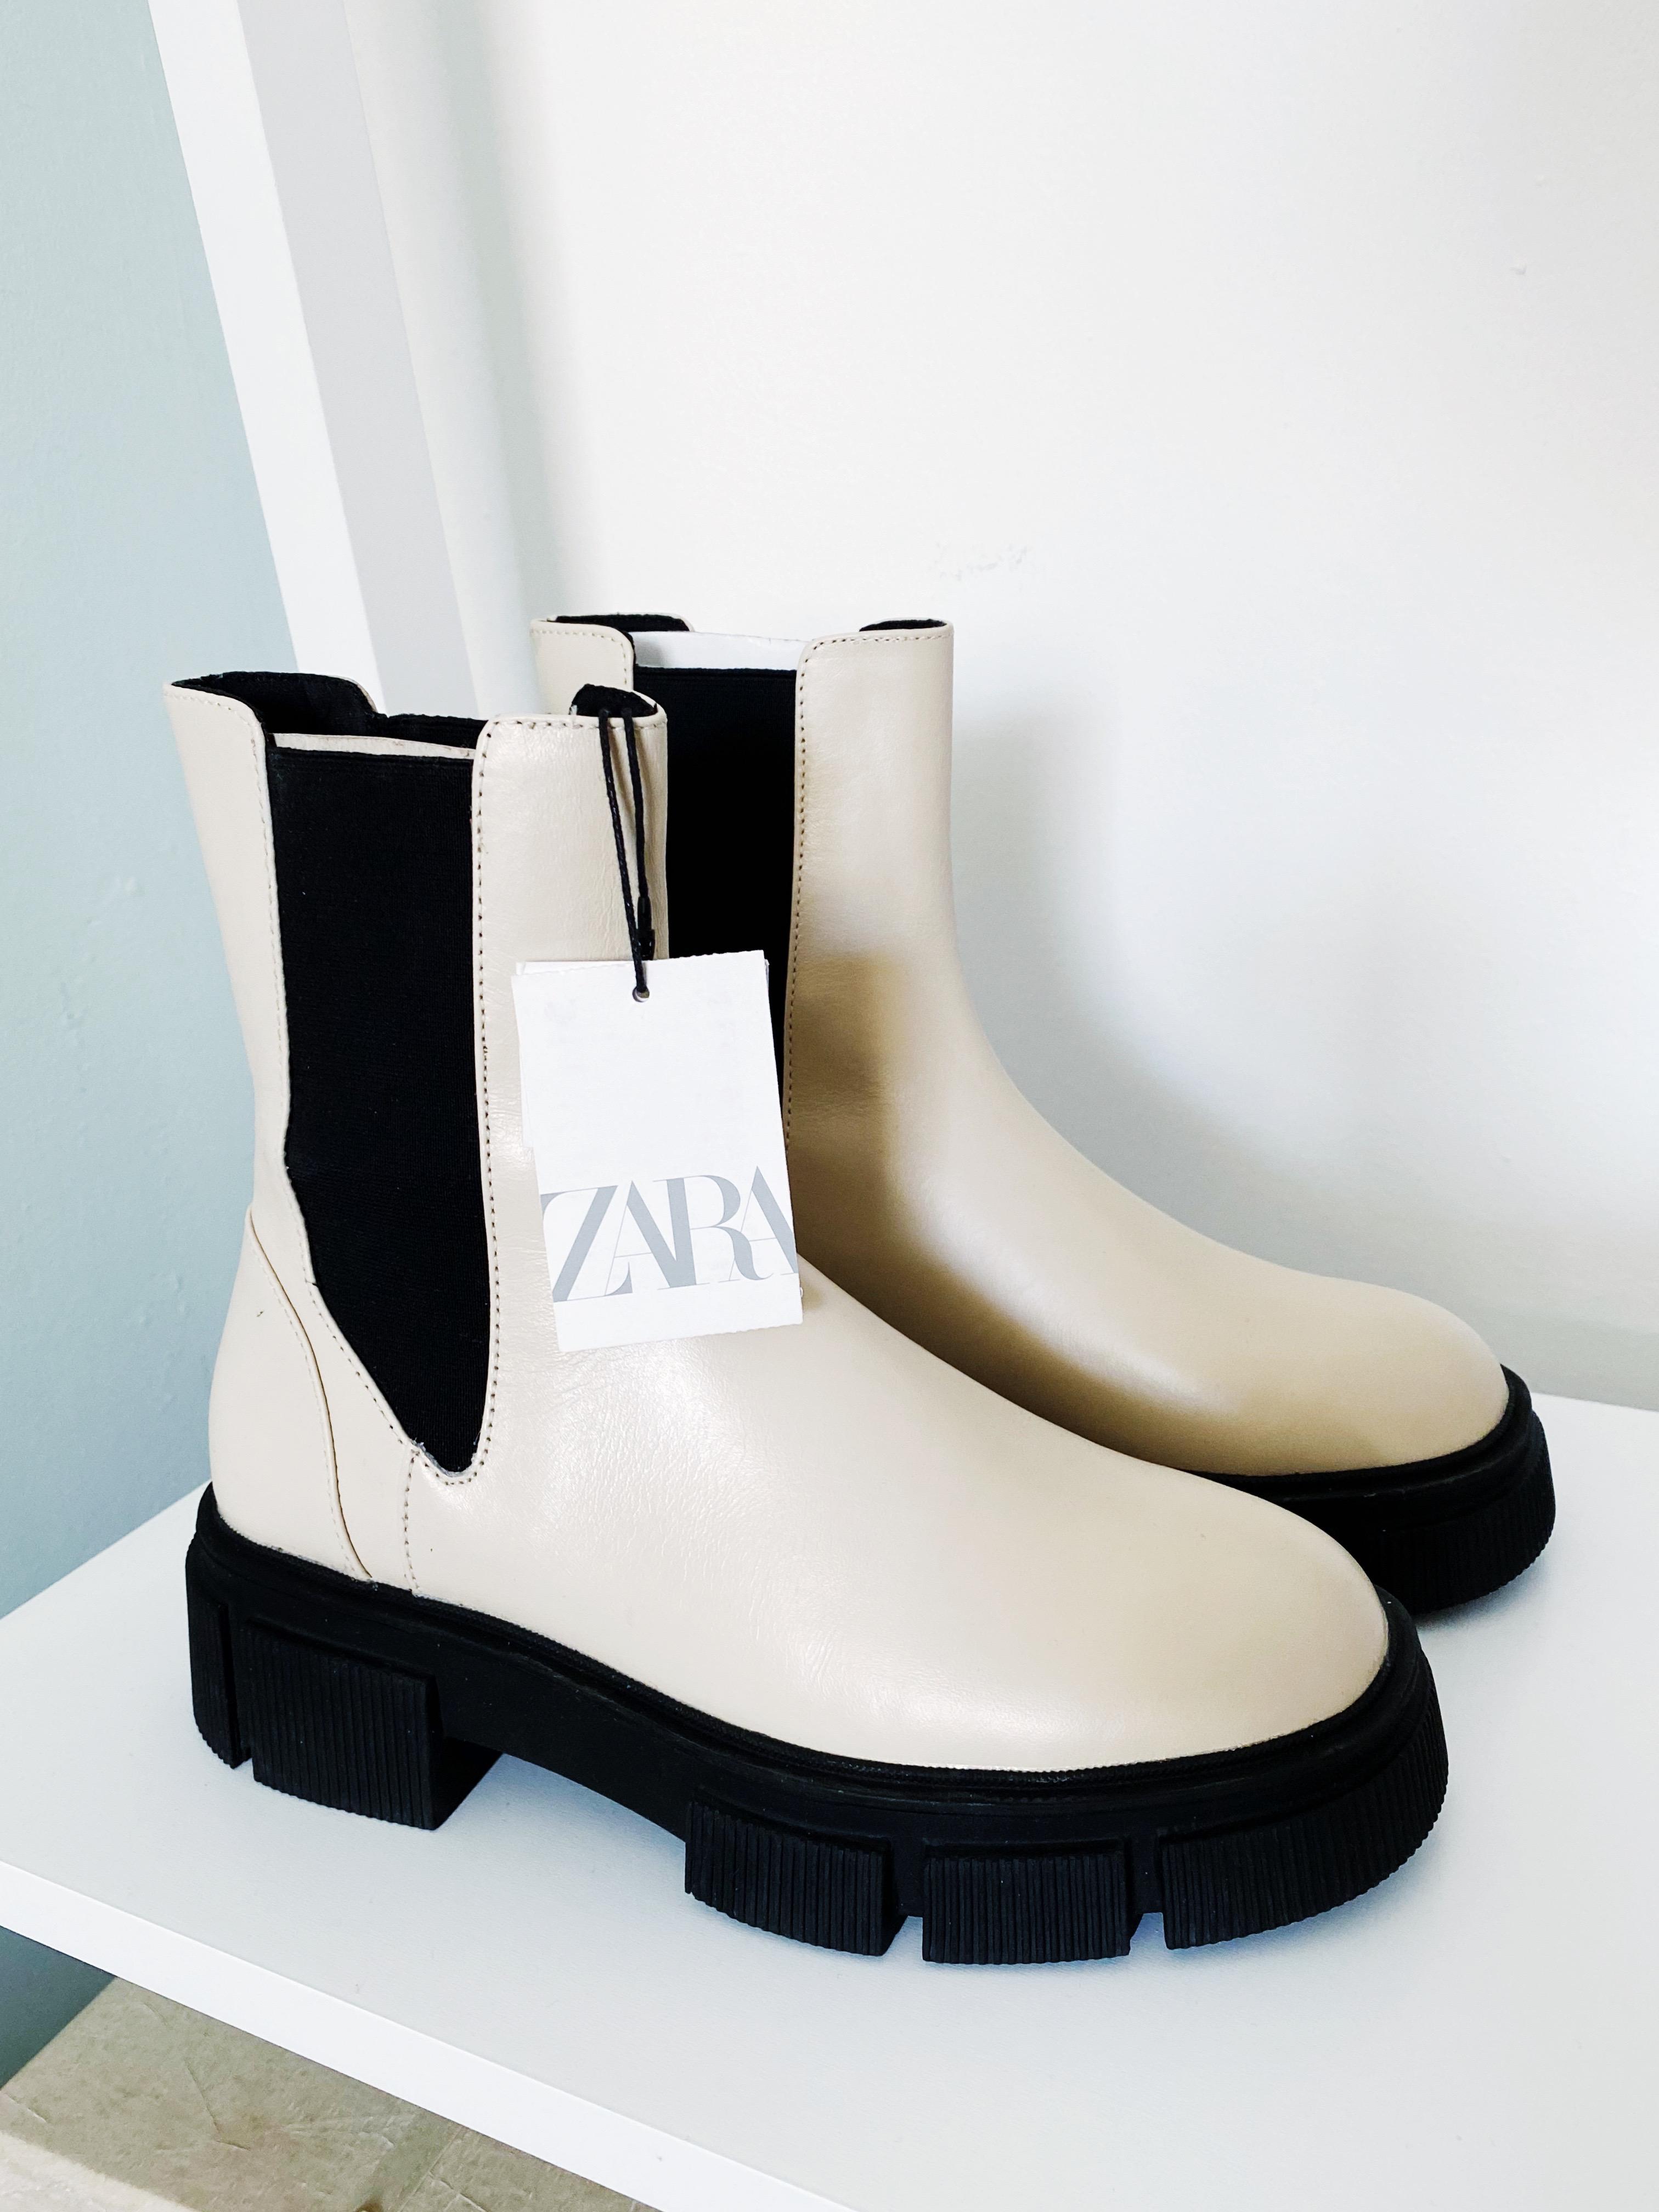 Image of Zara Chelsea boots